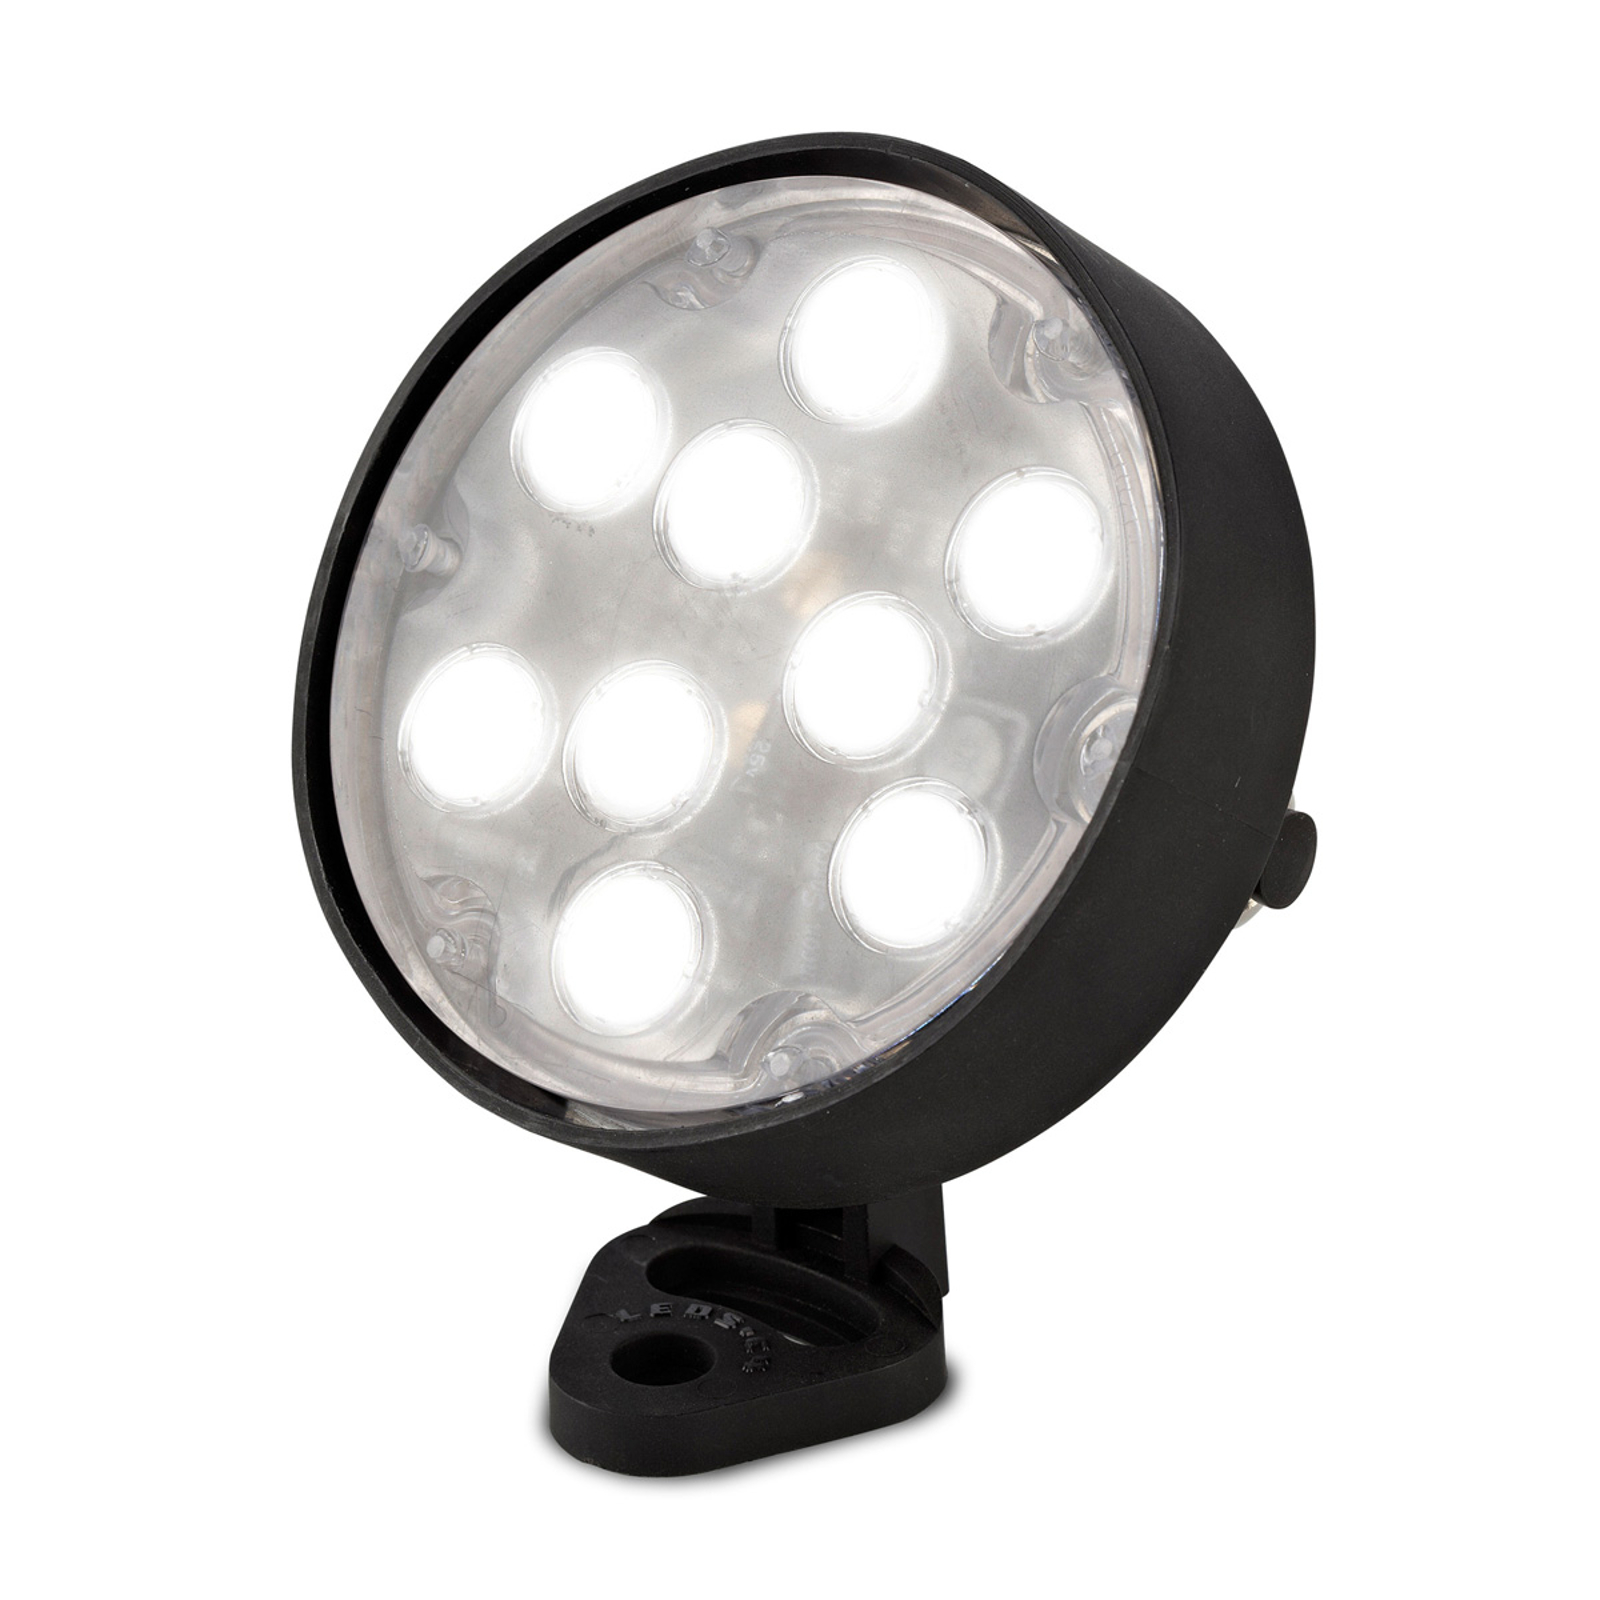 Vedenalainen LED-kohdevalo Aqua, halk. 10,4 cm